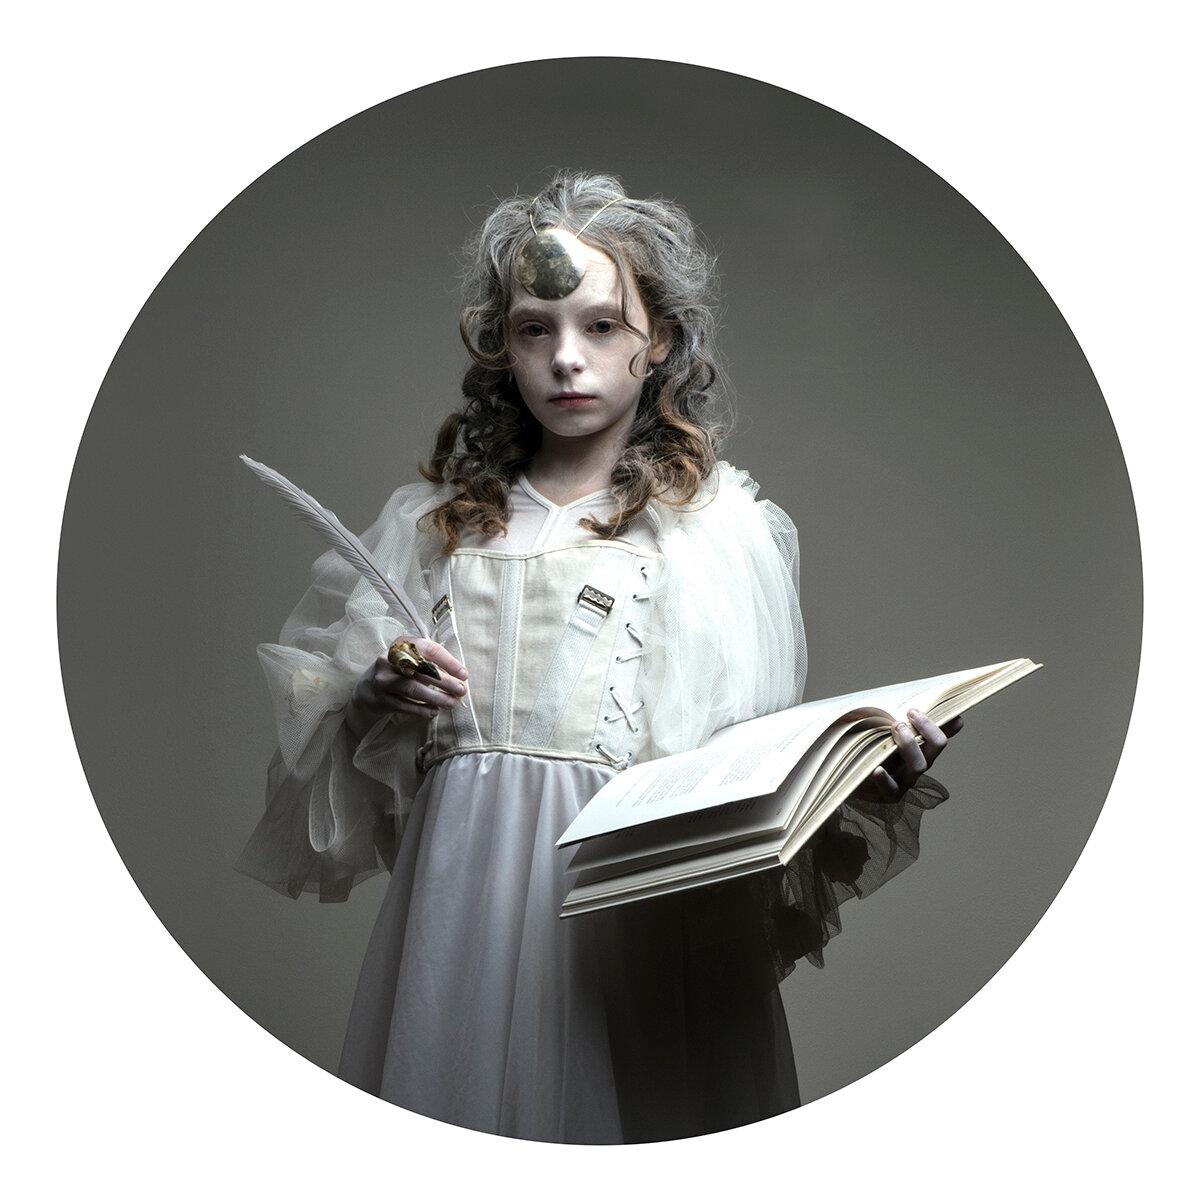 Childhood-Lost_06.jpg